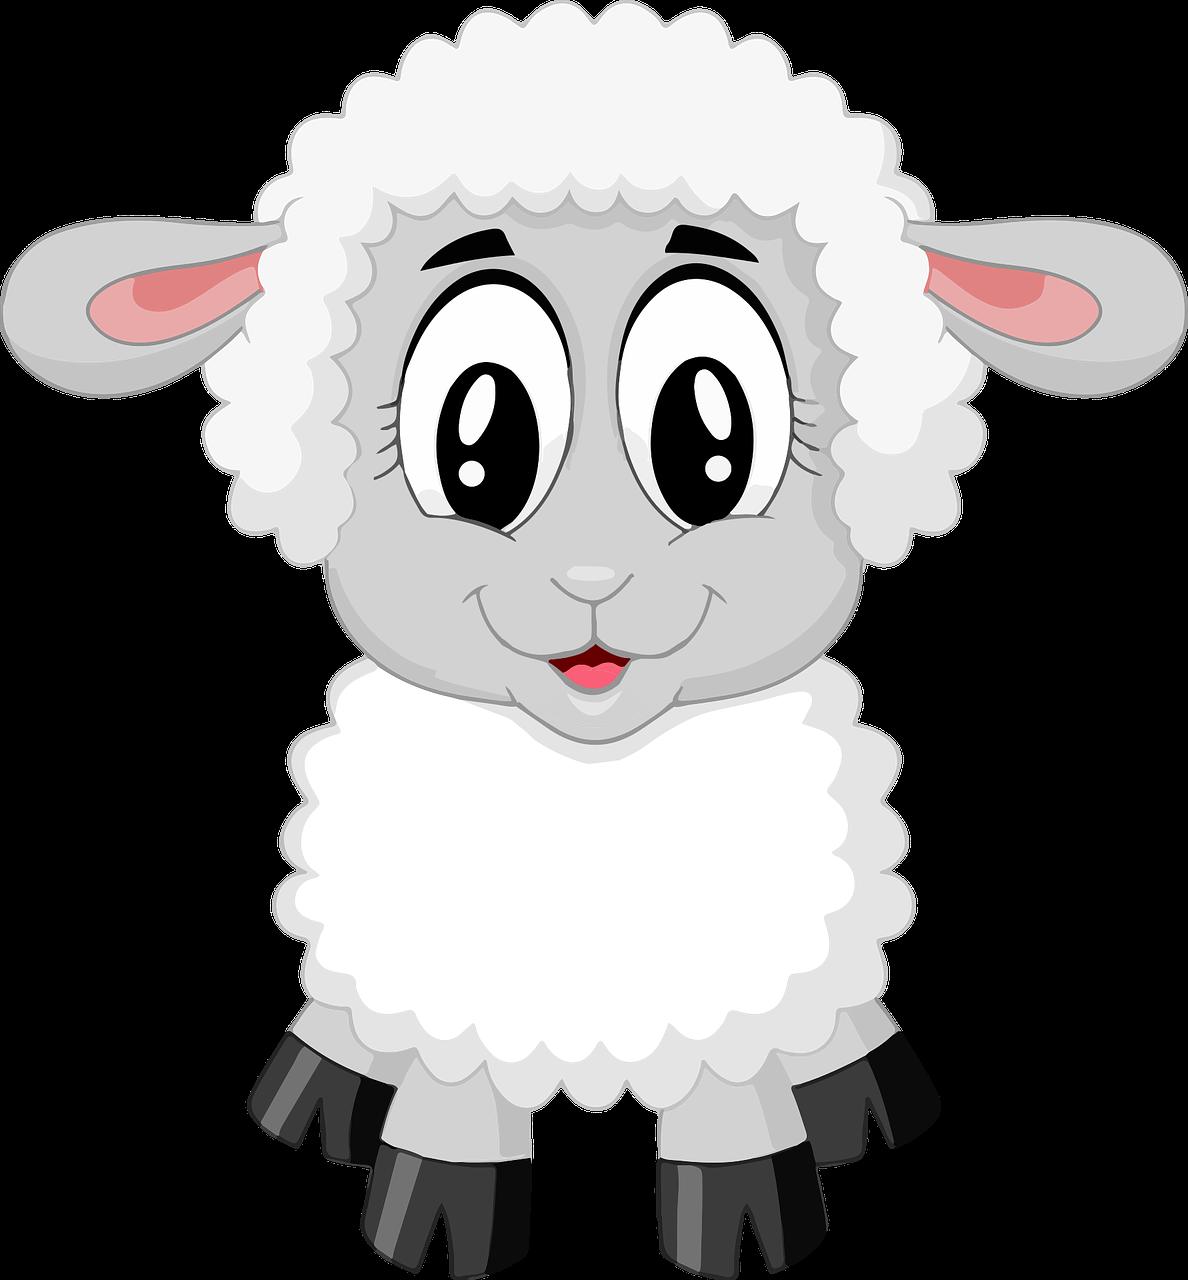 Pecorella bianca